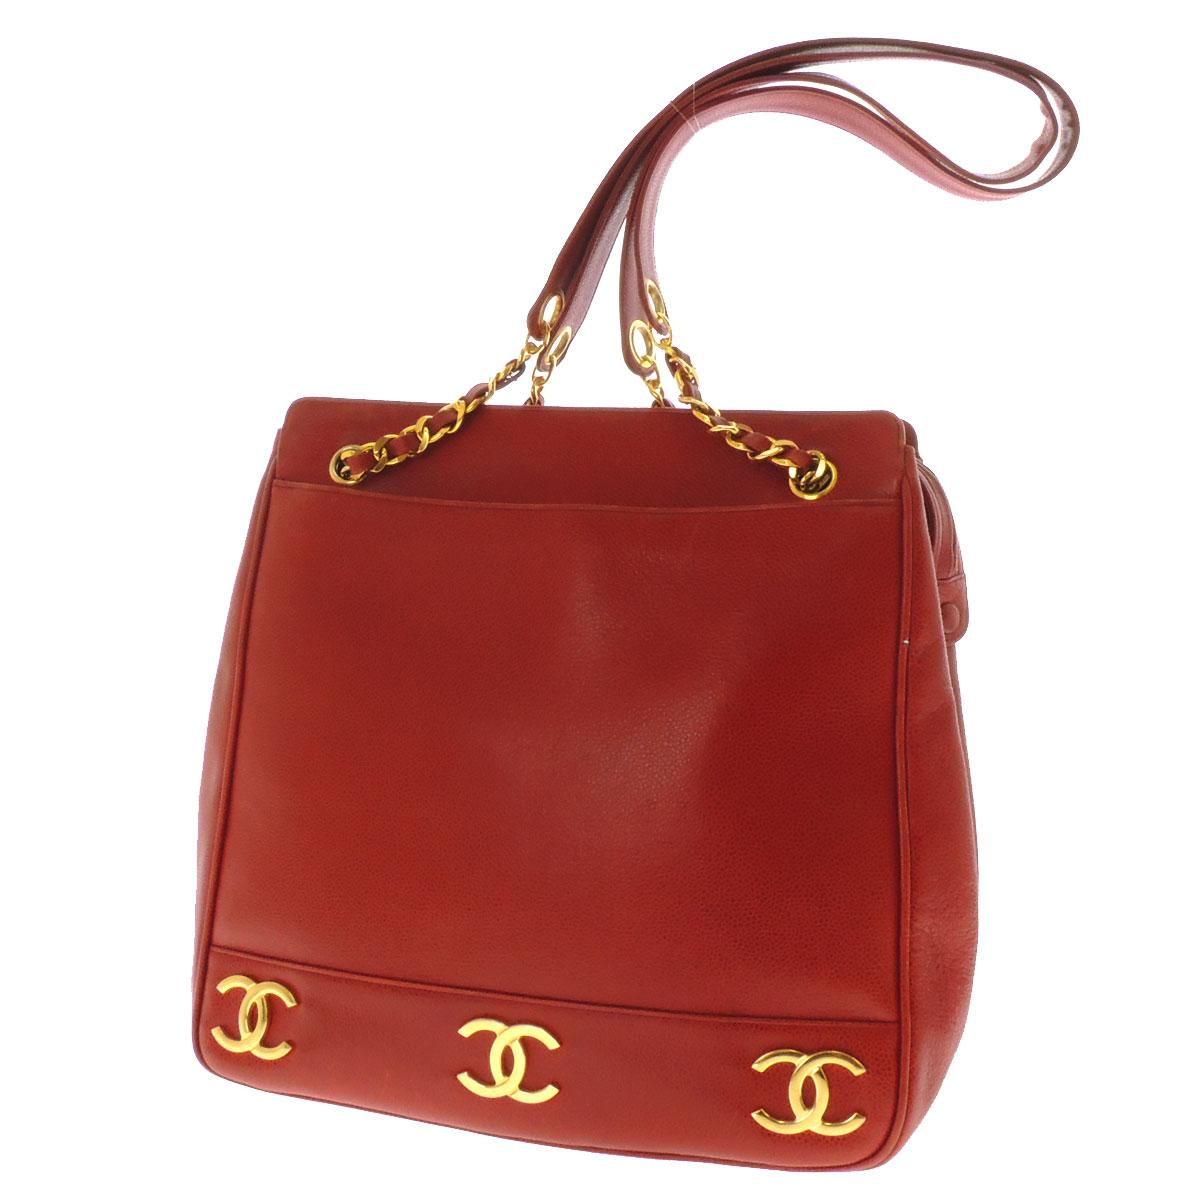 CHANEL chain Coco make shoulder bag caviar skin ladies